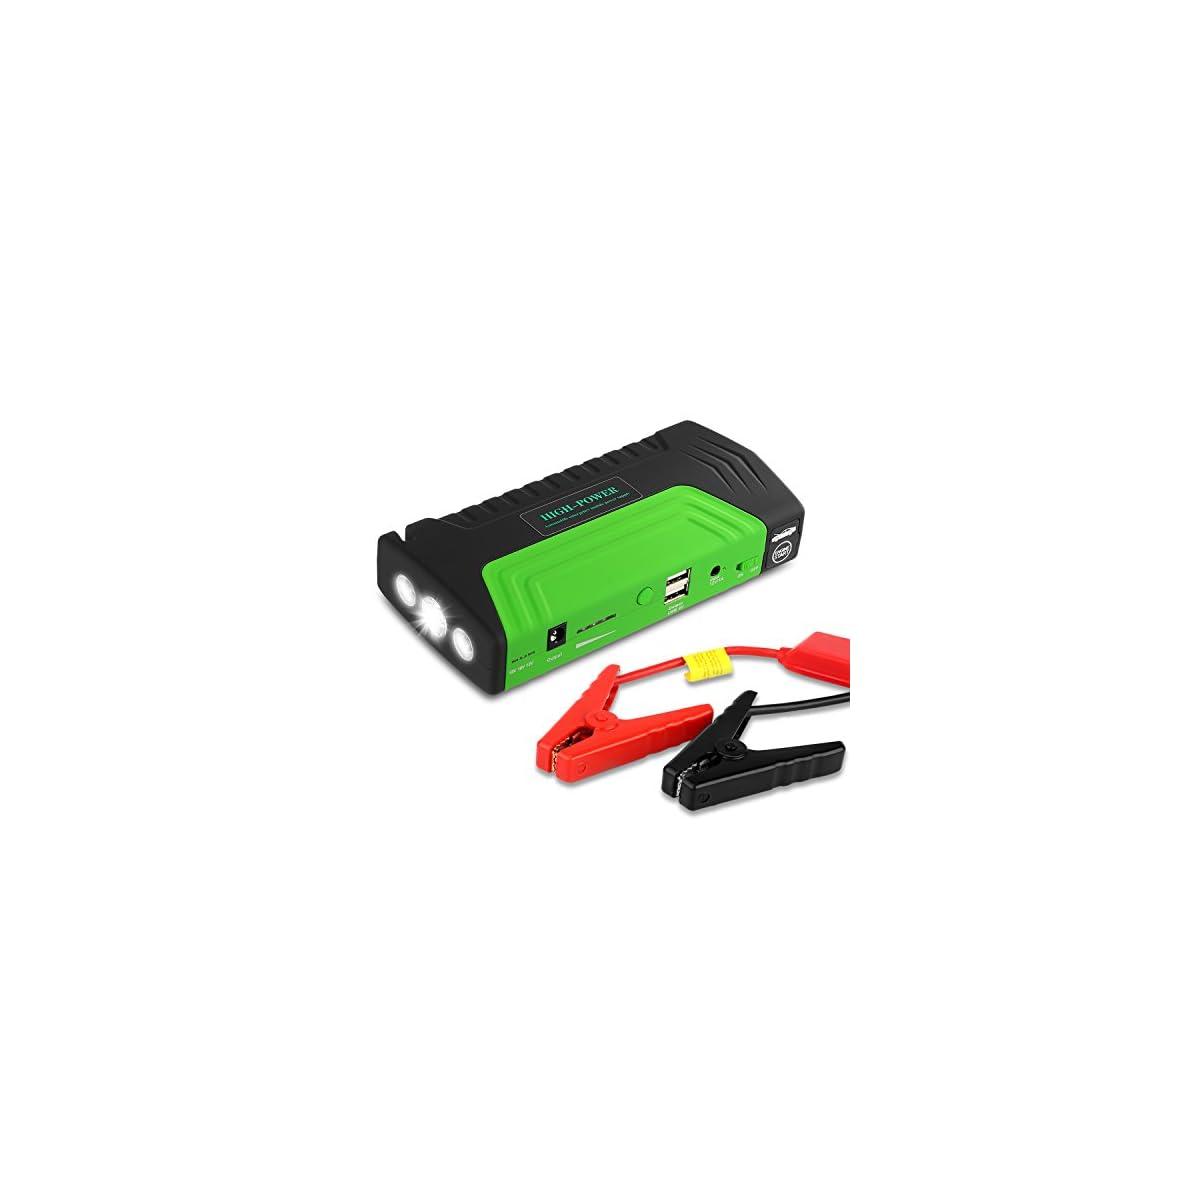 51TNNO6umpL. SS1200  - Arrancador de Coche de 16800 mAh, YOKKAO, Jump starter Cargador para Baterías de 12V y Cargador de 12V, 16V y 19V, Batería Externa con Luces de Emergencia, Kit de Arranque para Coche, Moto y Cargador de Smartphone, Laptop, etc. (Verde)